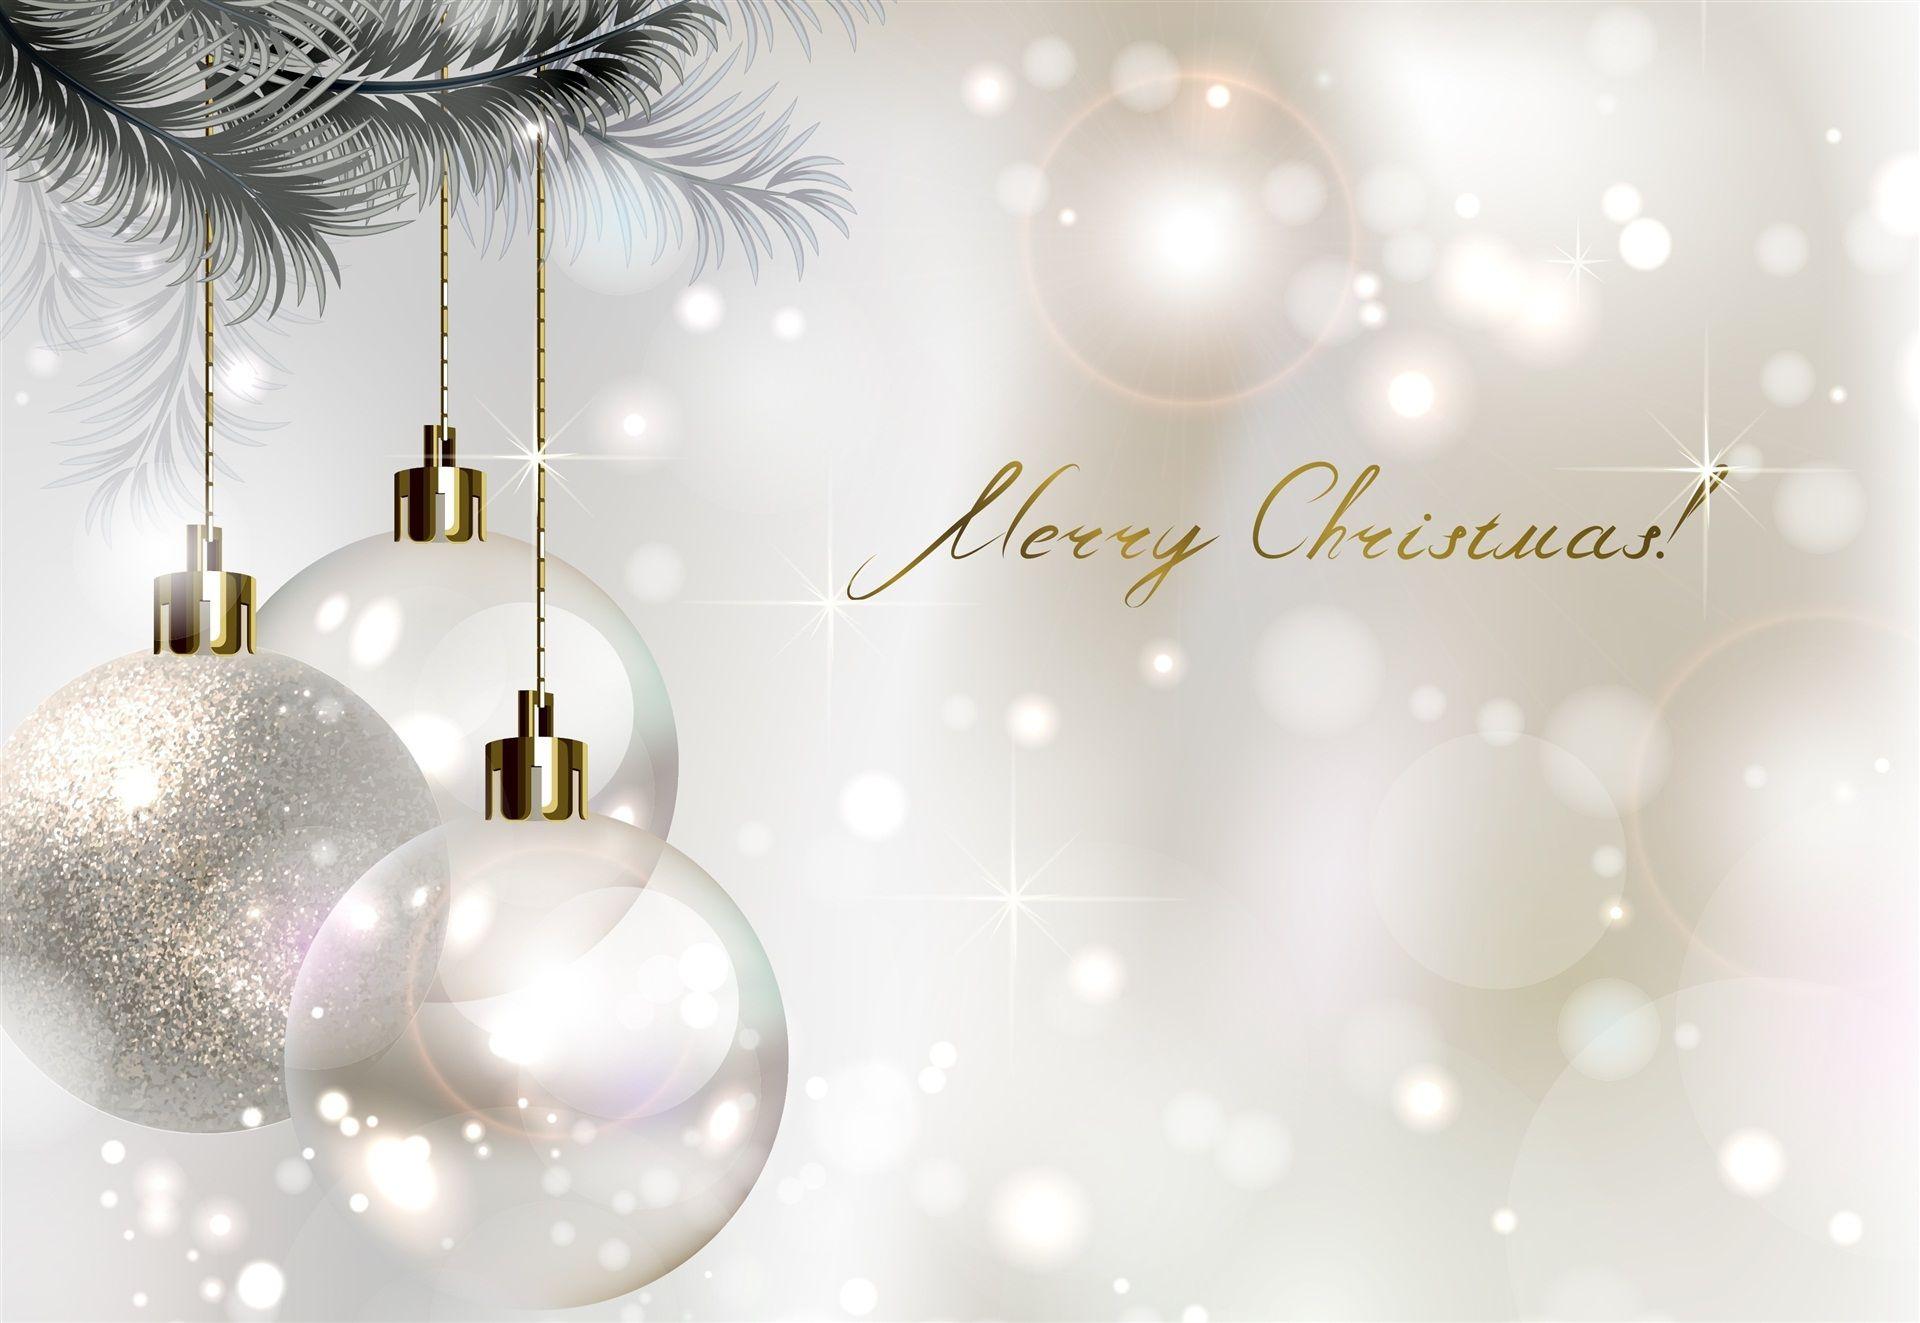 Wallpaper Christmas Tree Christmas Decorations Balloons